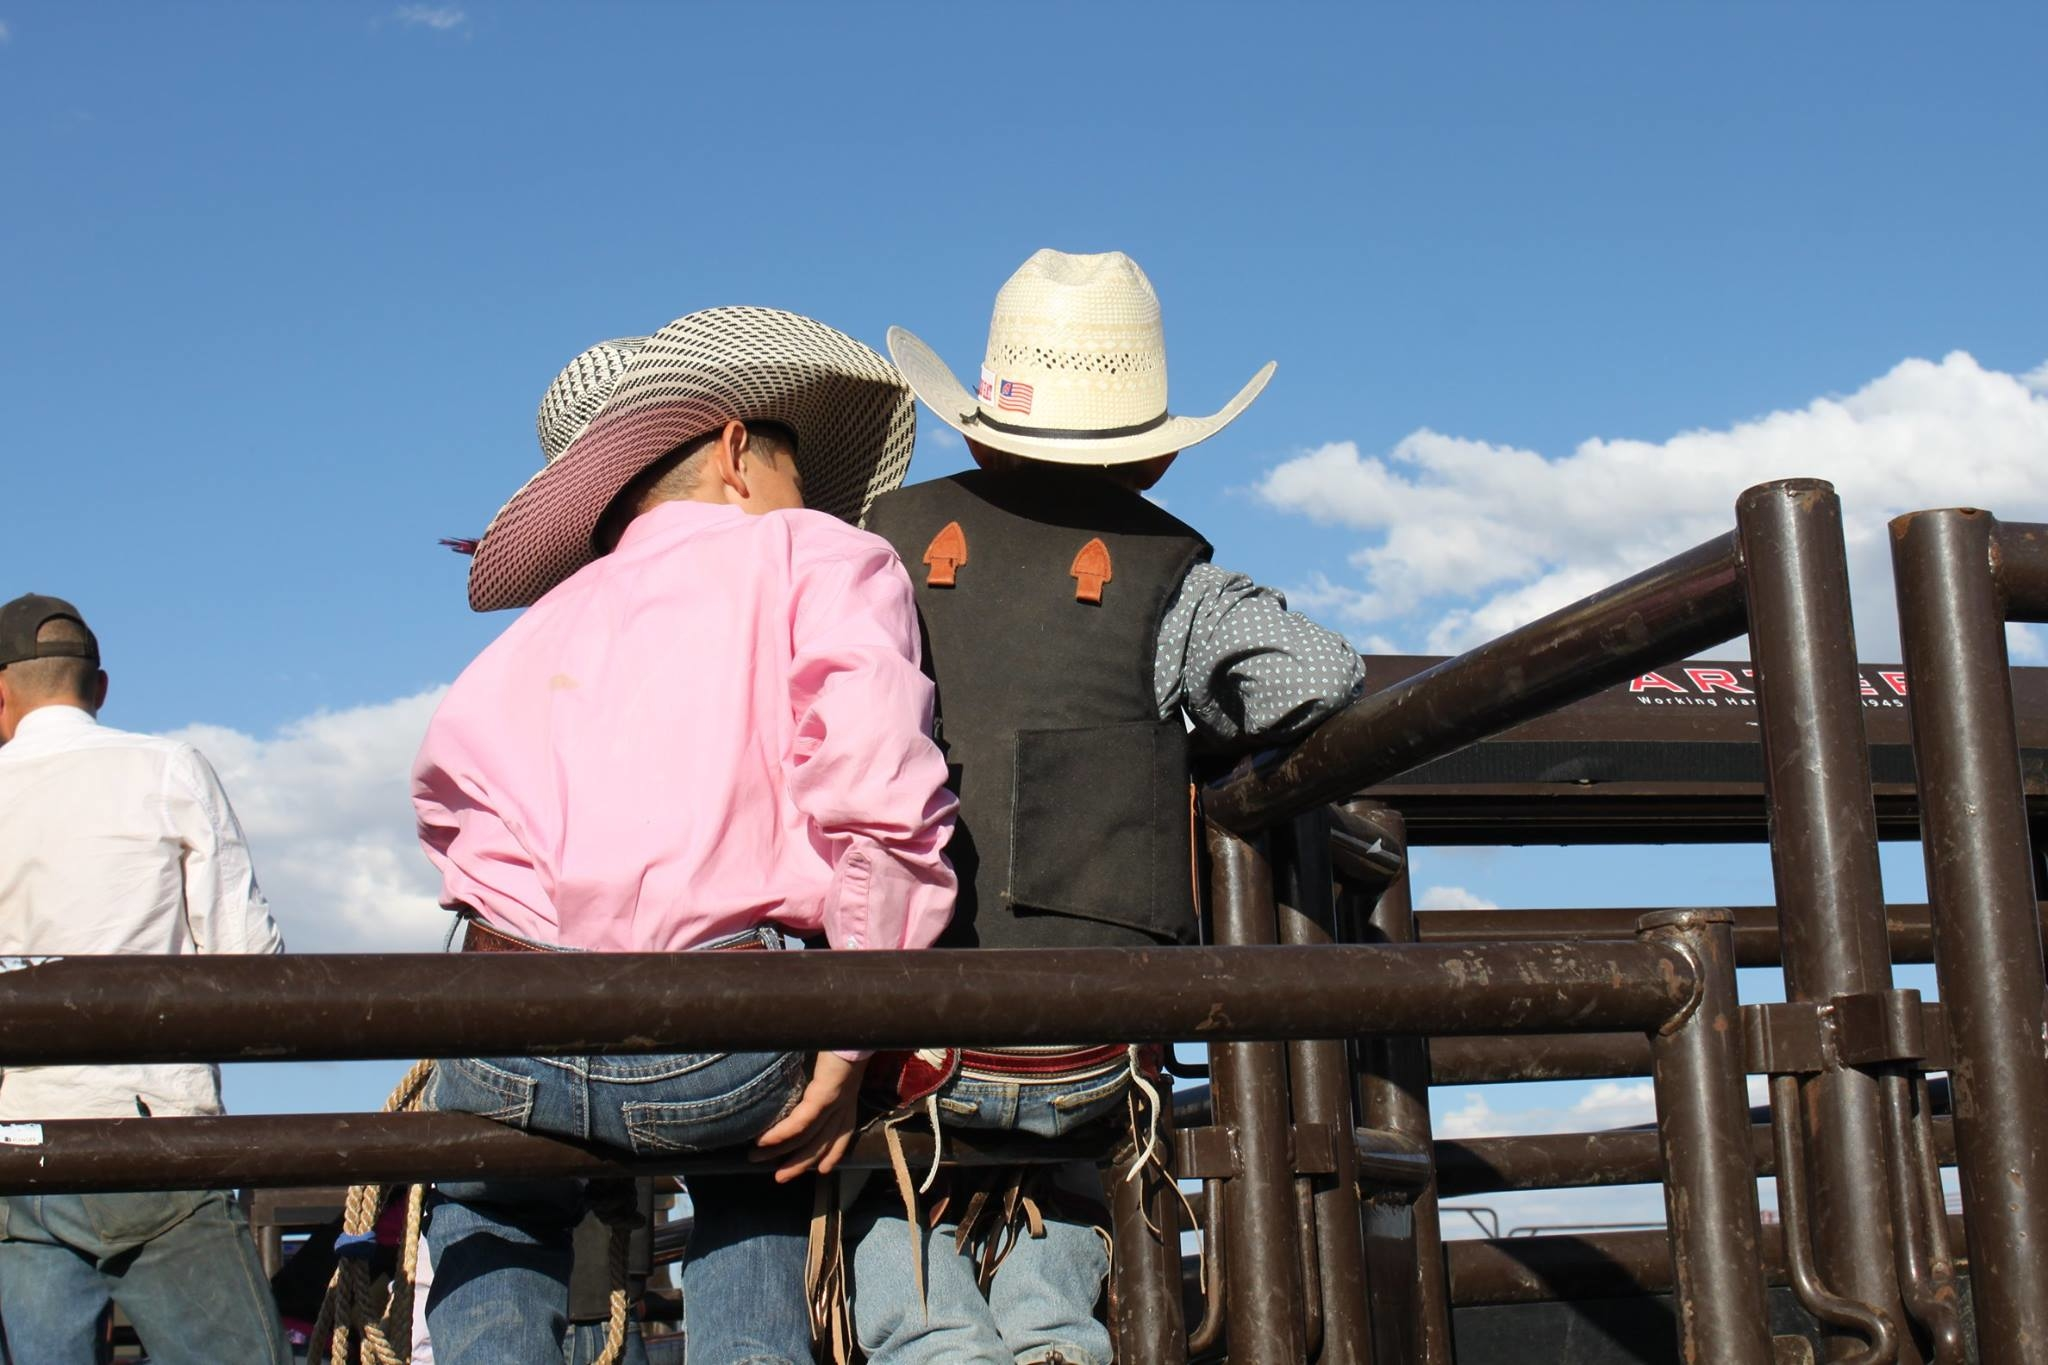 Red Desert Roundup Rodeo image 1